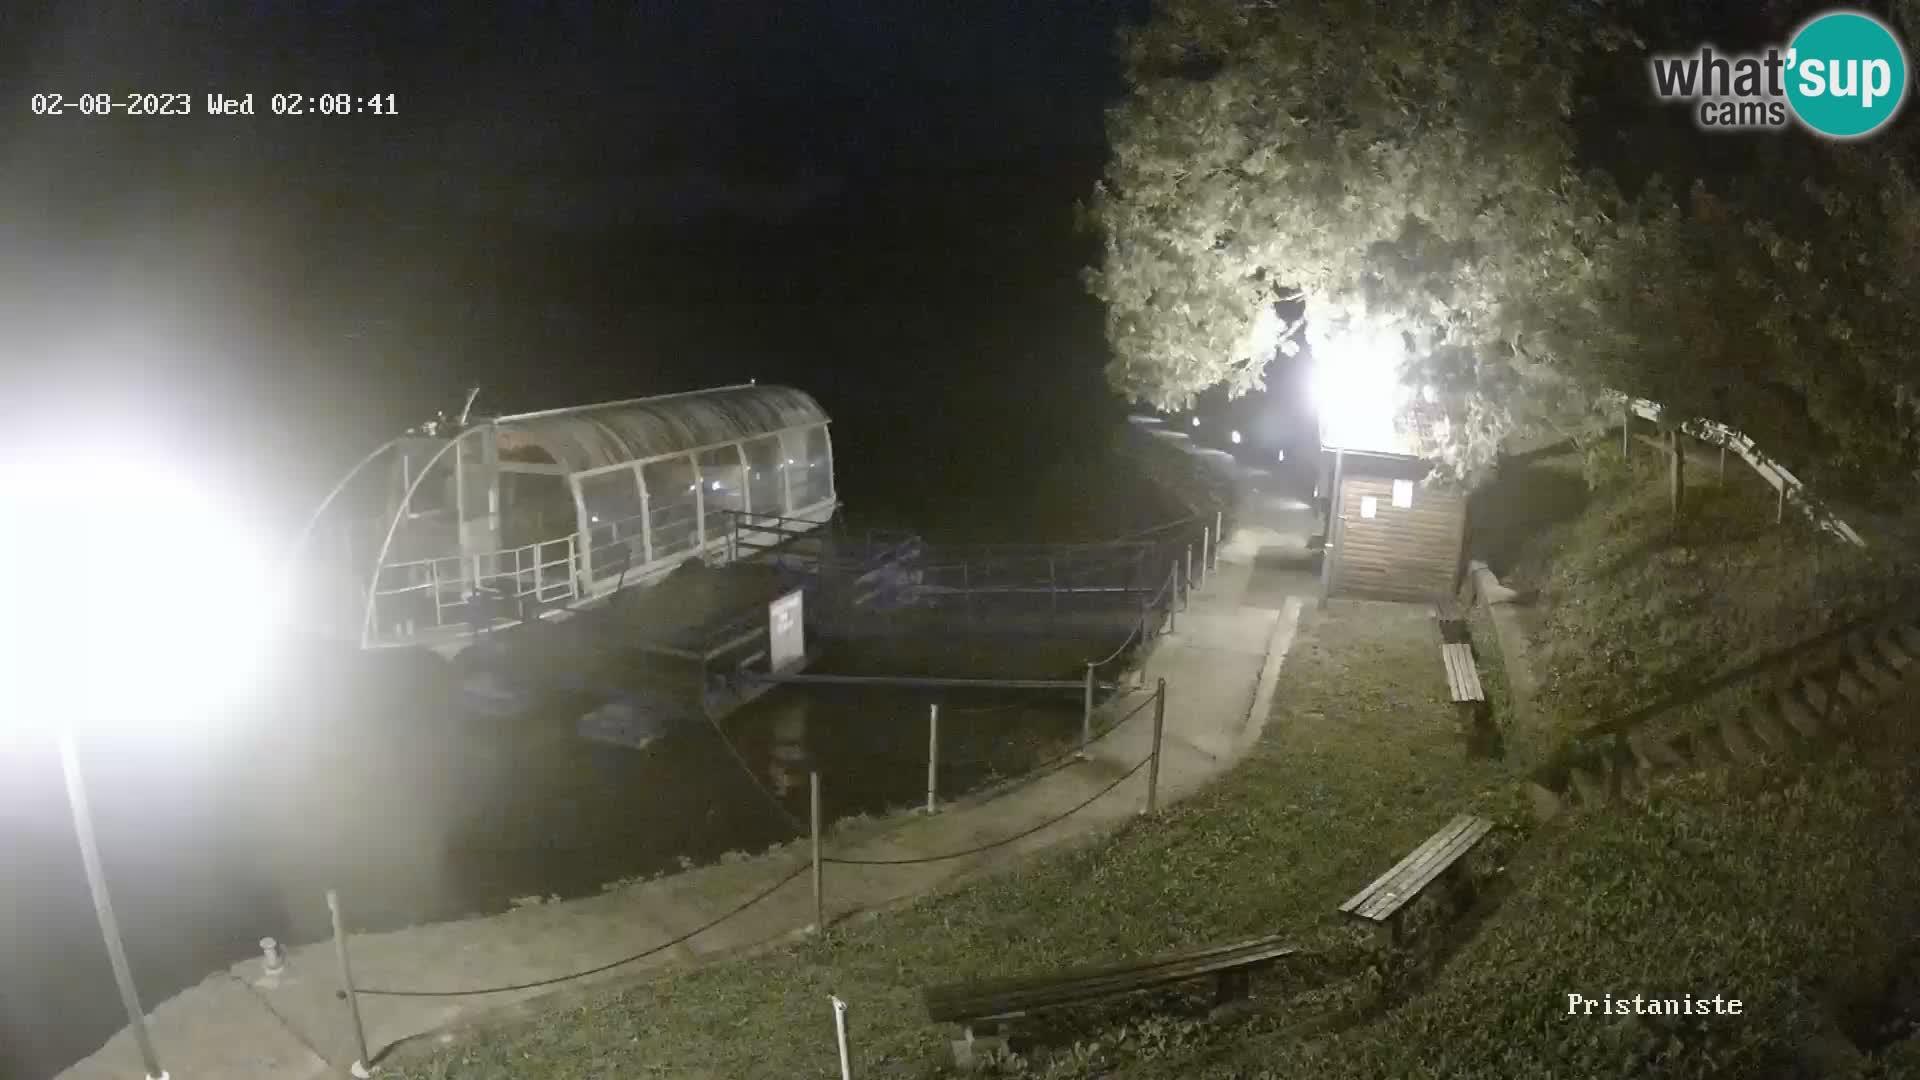 Lago Bajer camera en vivo Bajersko Jezero Fužine barco turístico